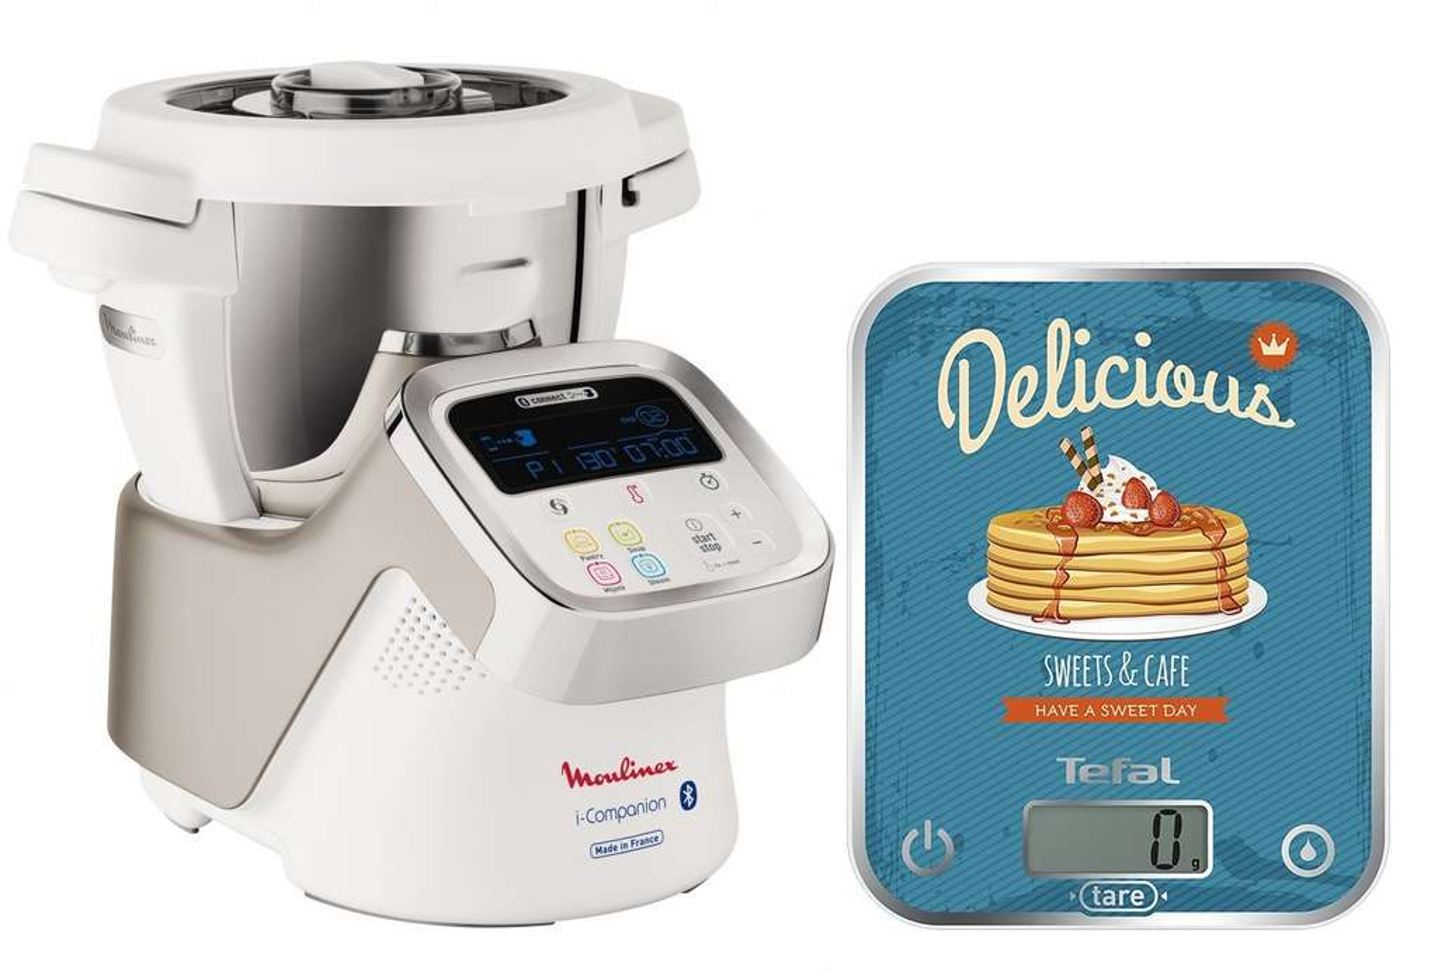 robot de cuisine moulinex i companion hf9001 balance de cuisine tefal optiss delicious. Black Bedroom Furniture Sets. Home Design Ideas